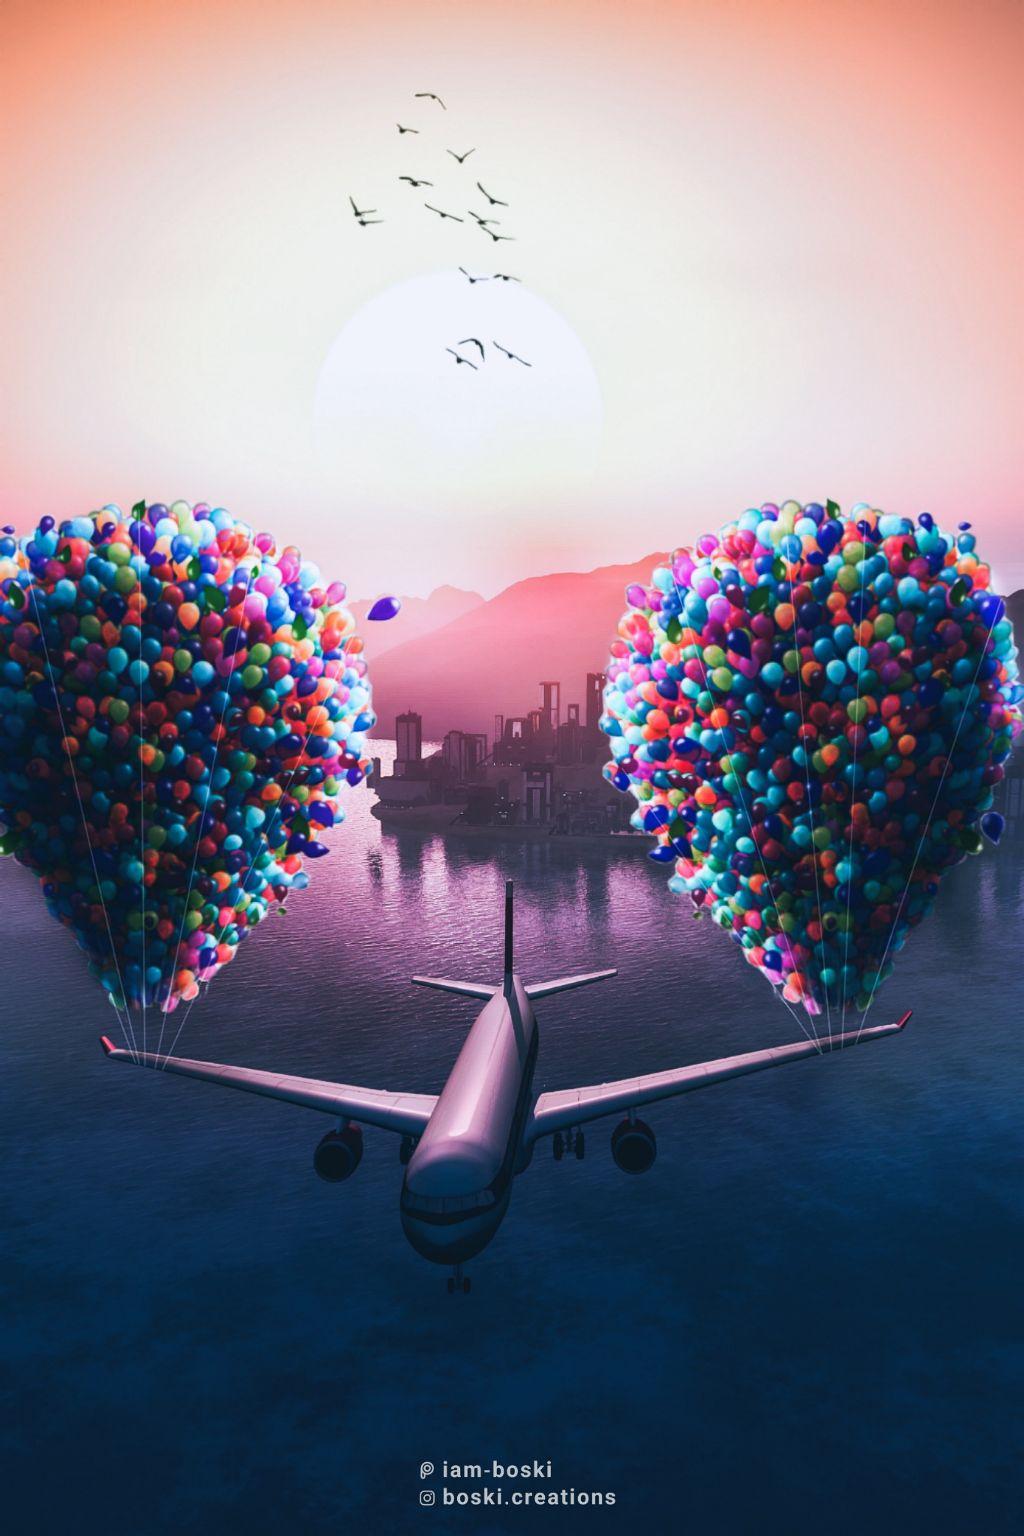 Fly me ✈️    Image source: Pexels     #freetoedit #editedbyme #editedwithpicsart #aeroplane #birds #sea #surrealism #balloons #toolazytoputhashtags